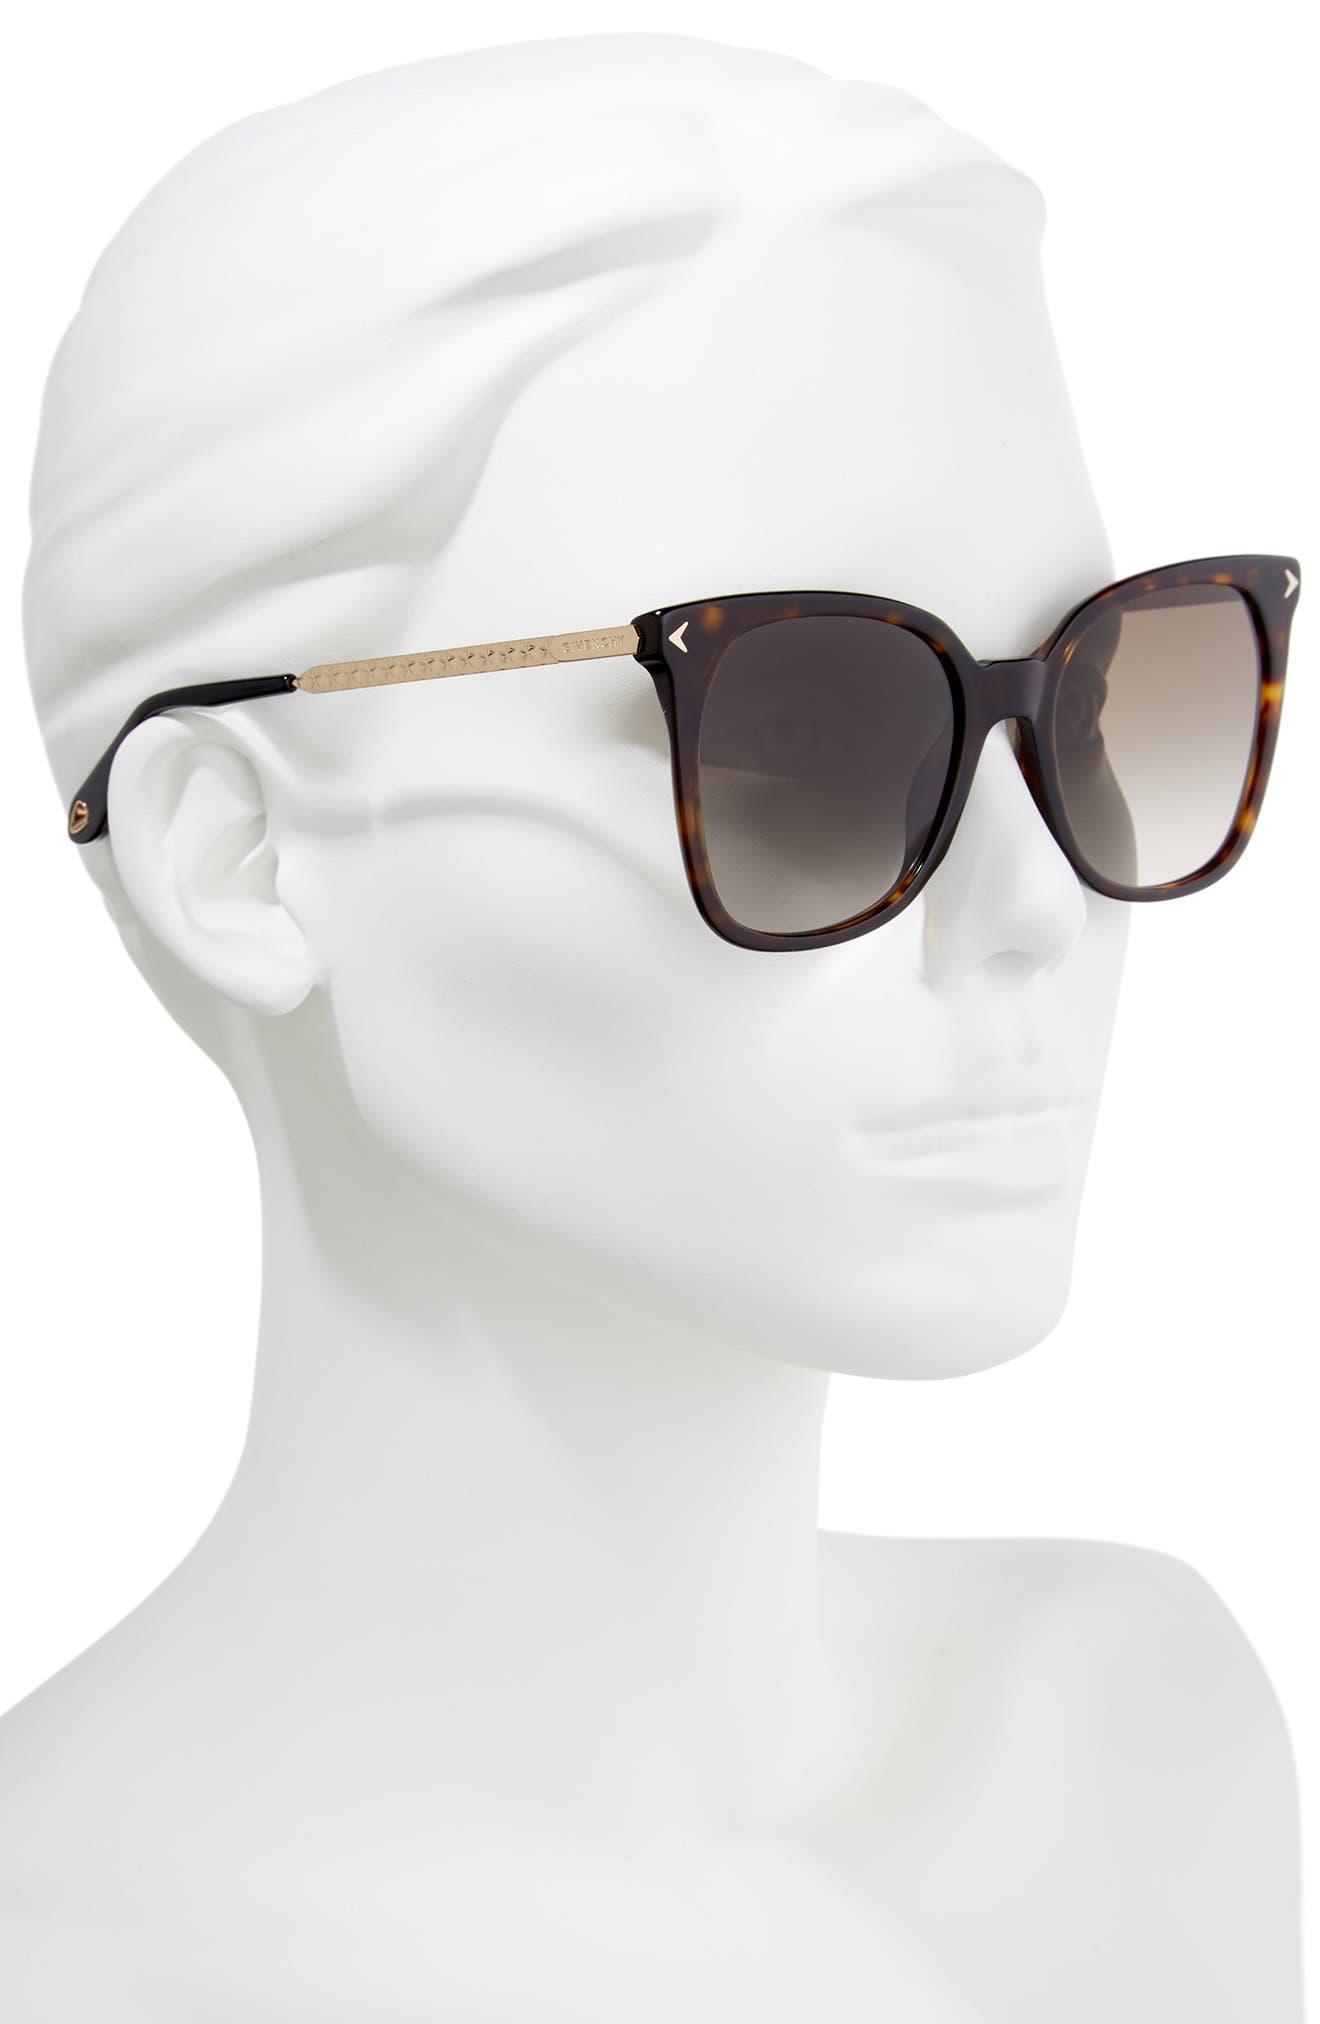 54mm Square Sunglasses,                             Alternate thumbnail 2, color,                             Dark Havana